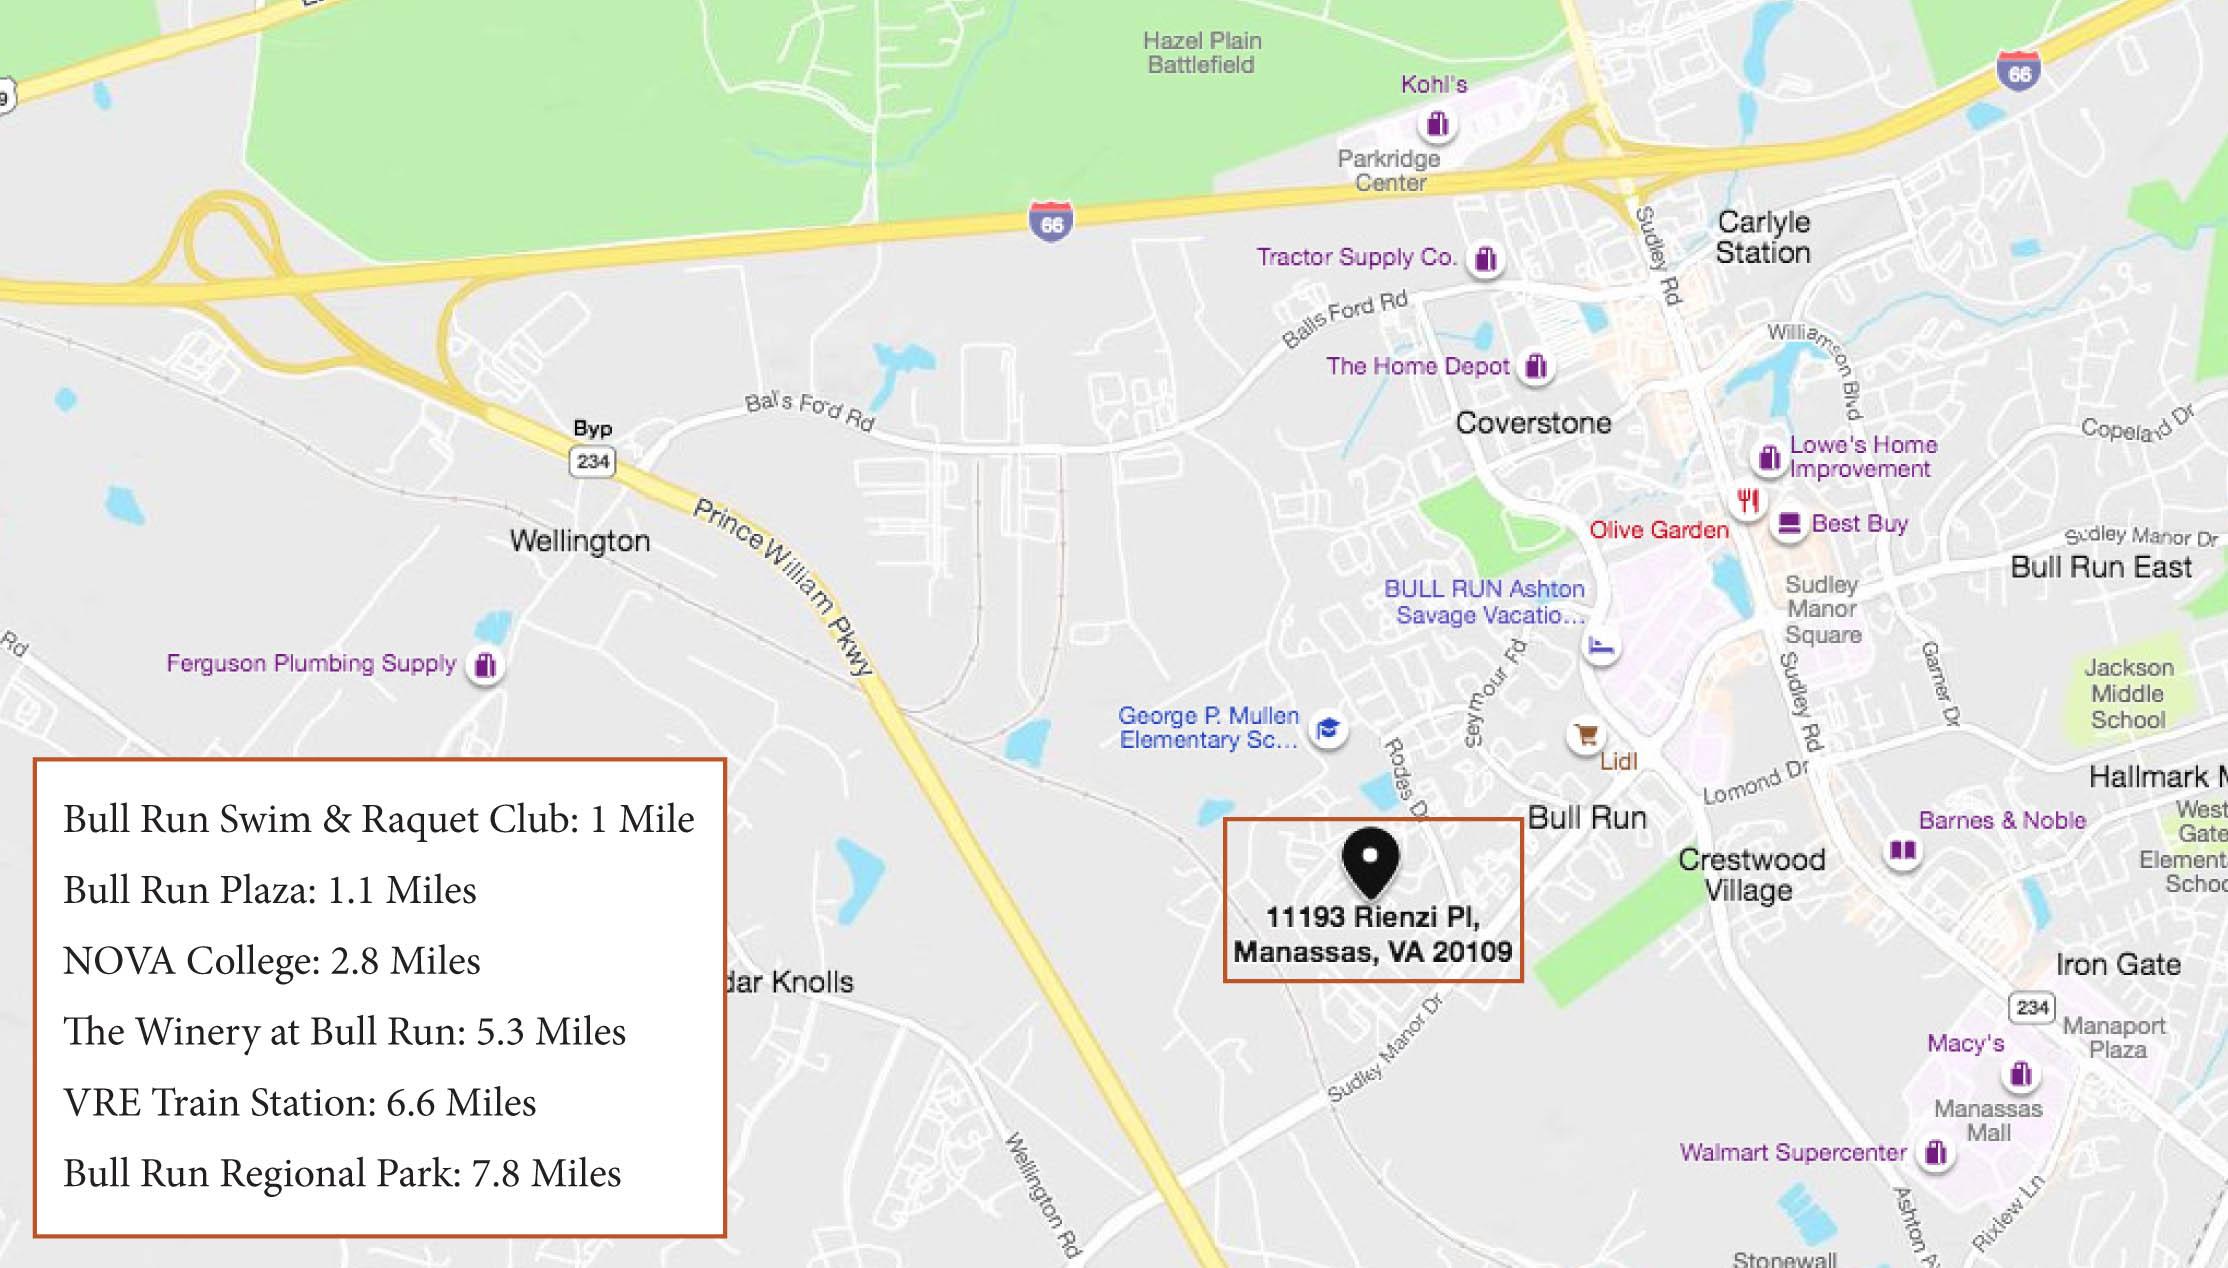 11193 Rienzi Pl #102, Manassas- Map